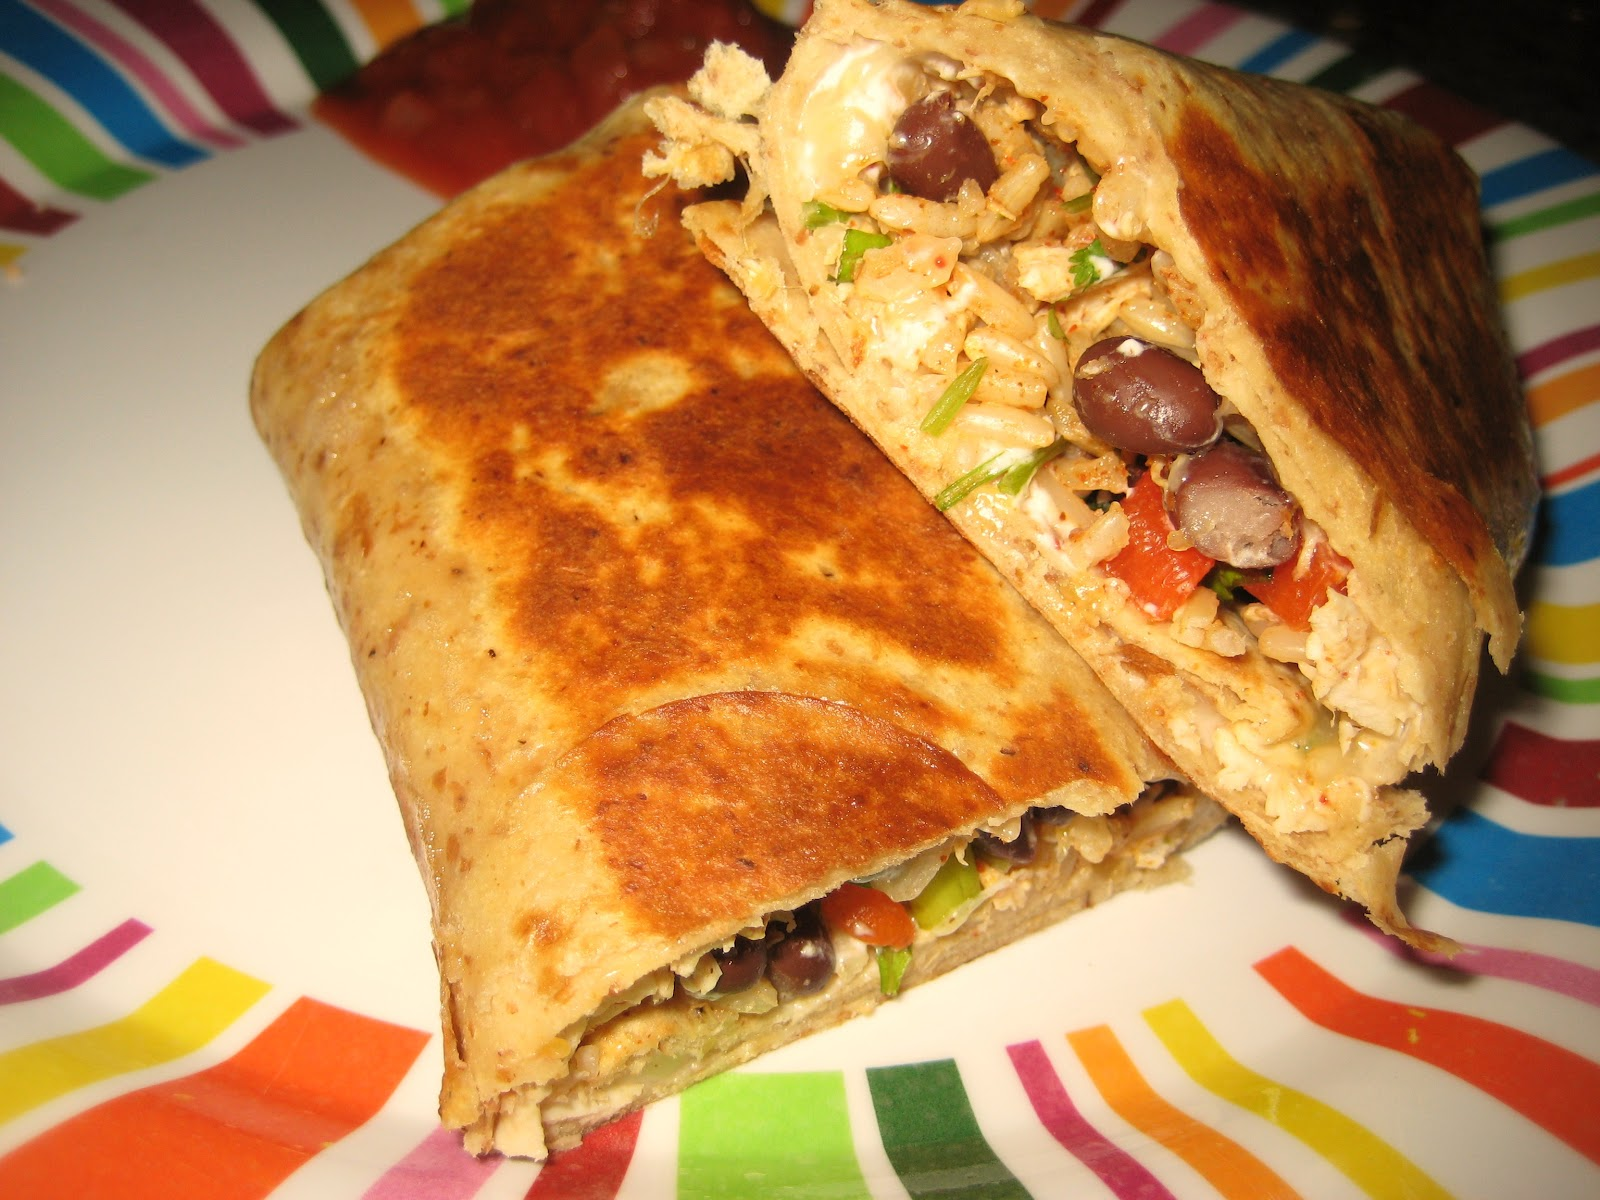 Britt's Apron: Crispy Southwest Chicken Wrap